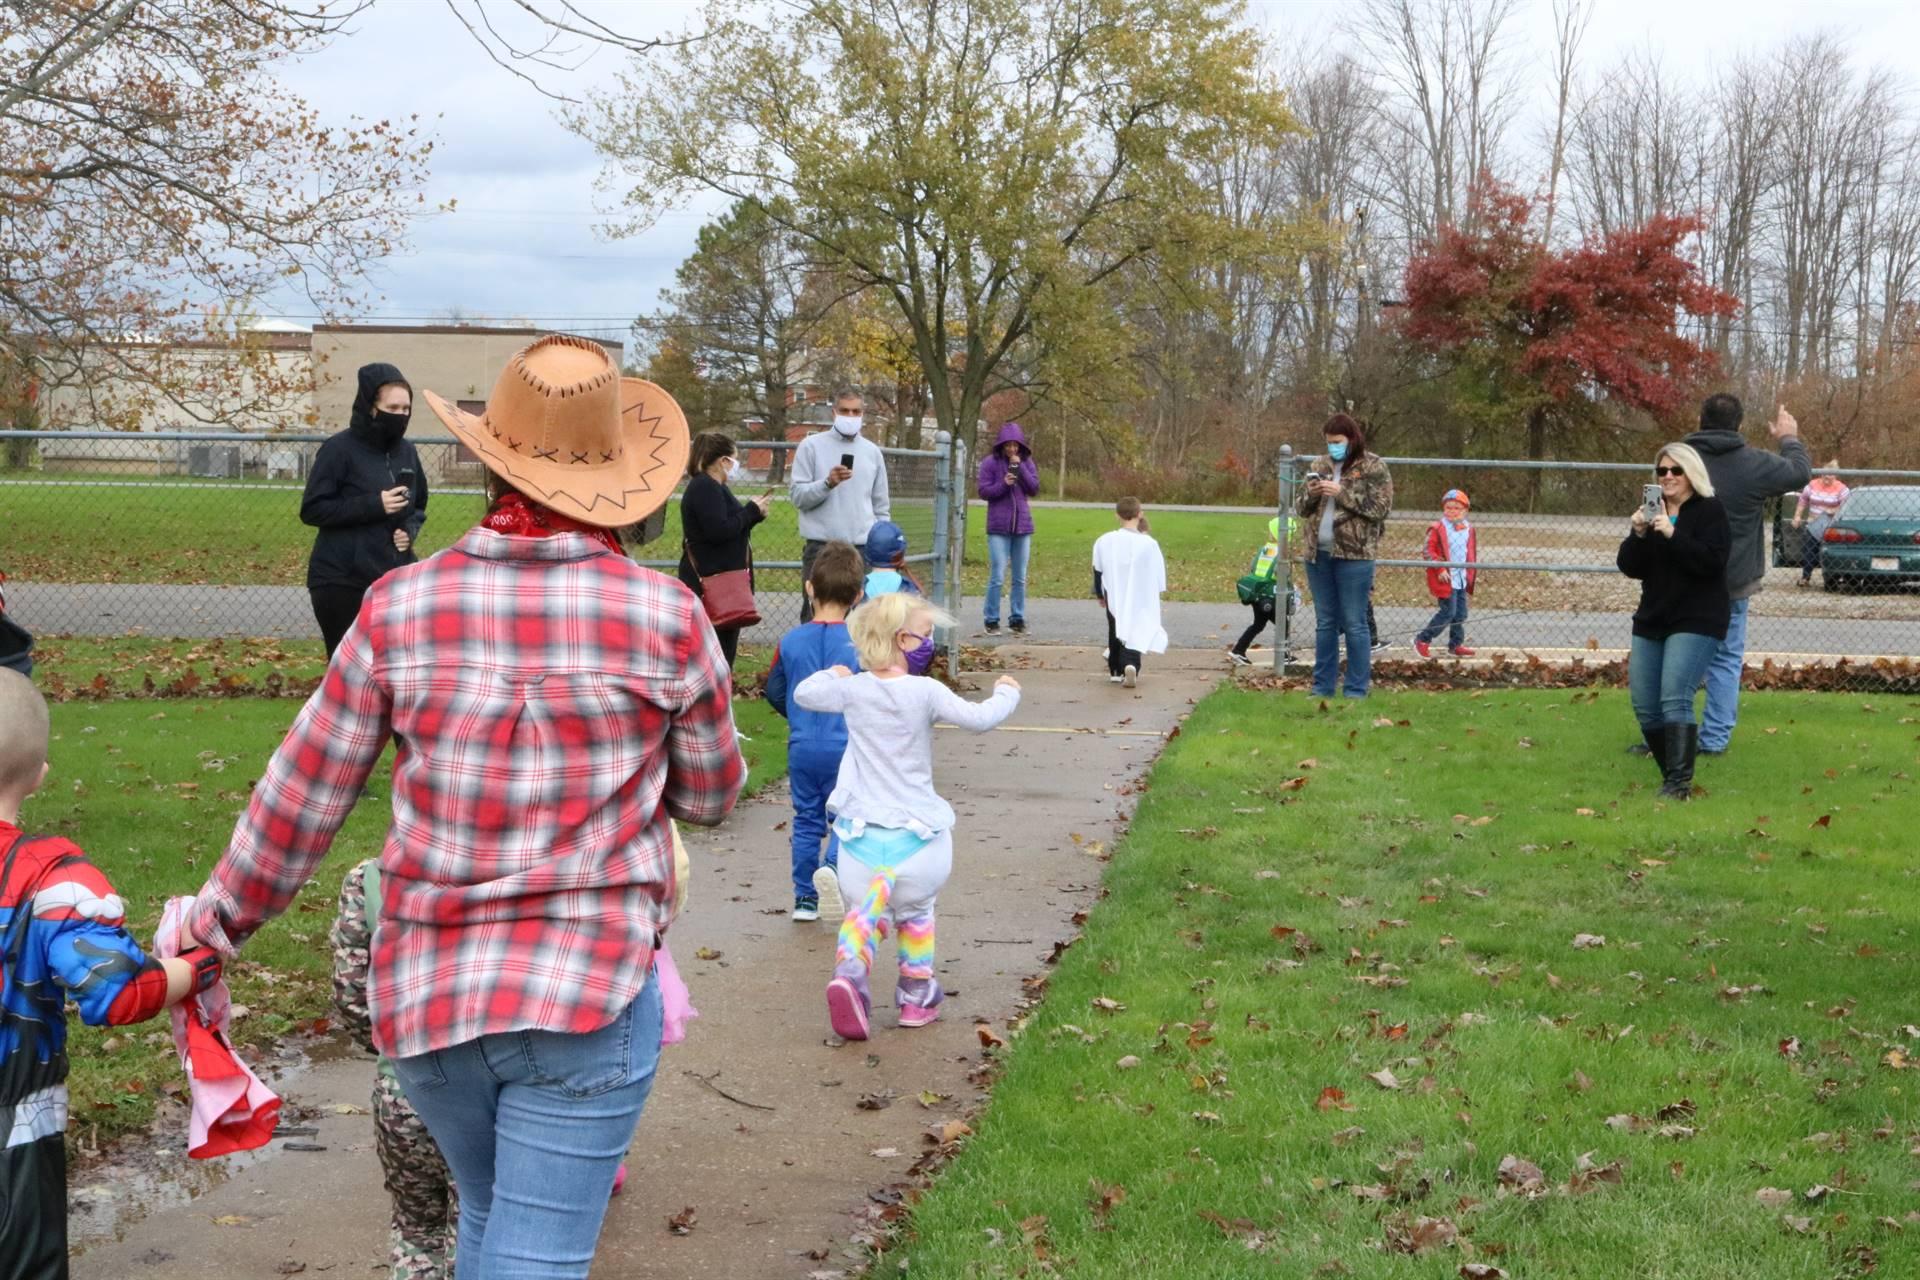 kids walking on sidewalk dressed for halloween